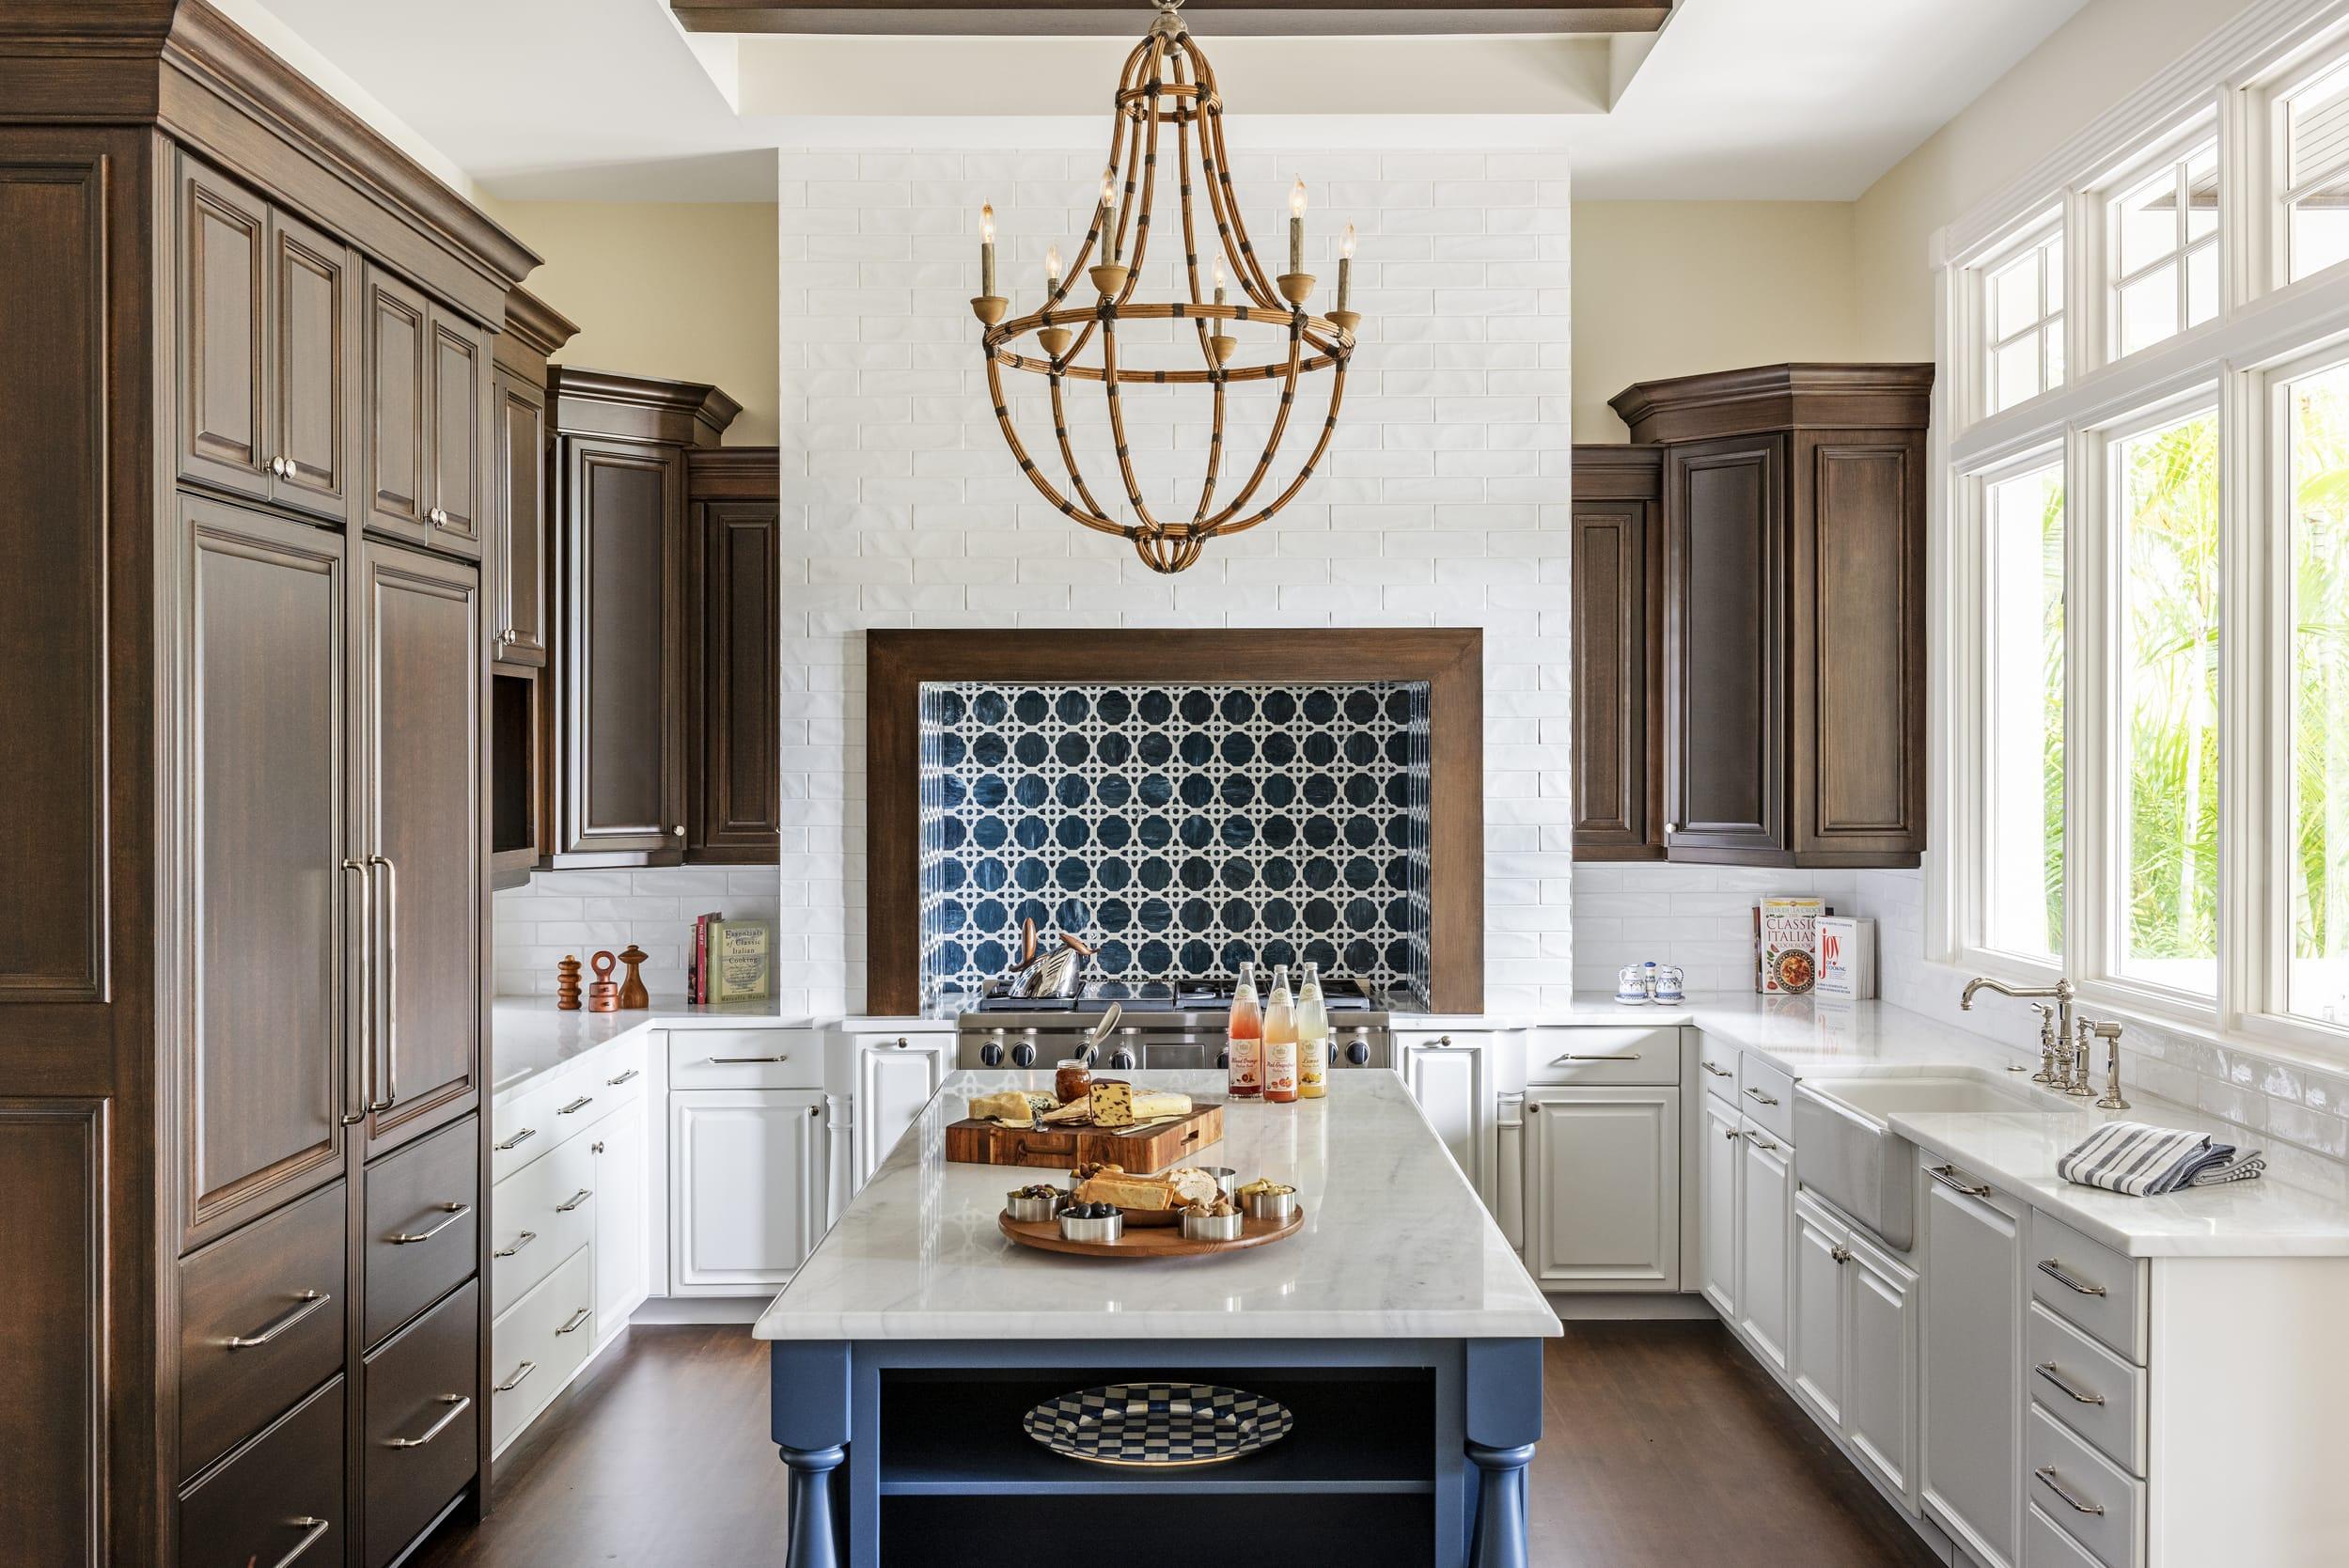 Jeffrey Fisher Home White Tile Kitchen Dark Wood Cabinets